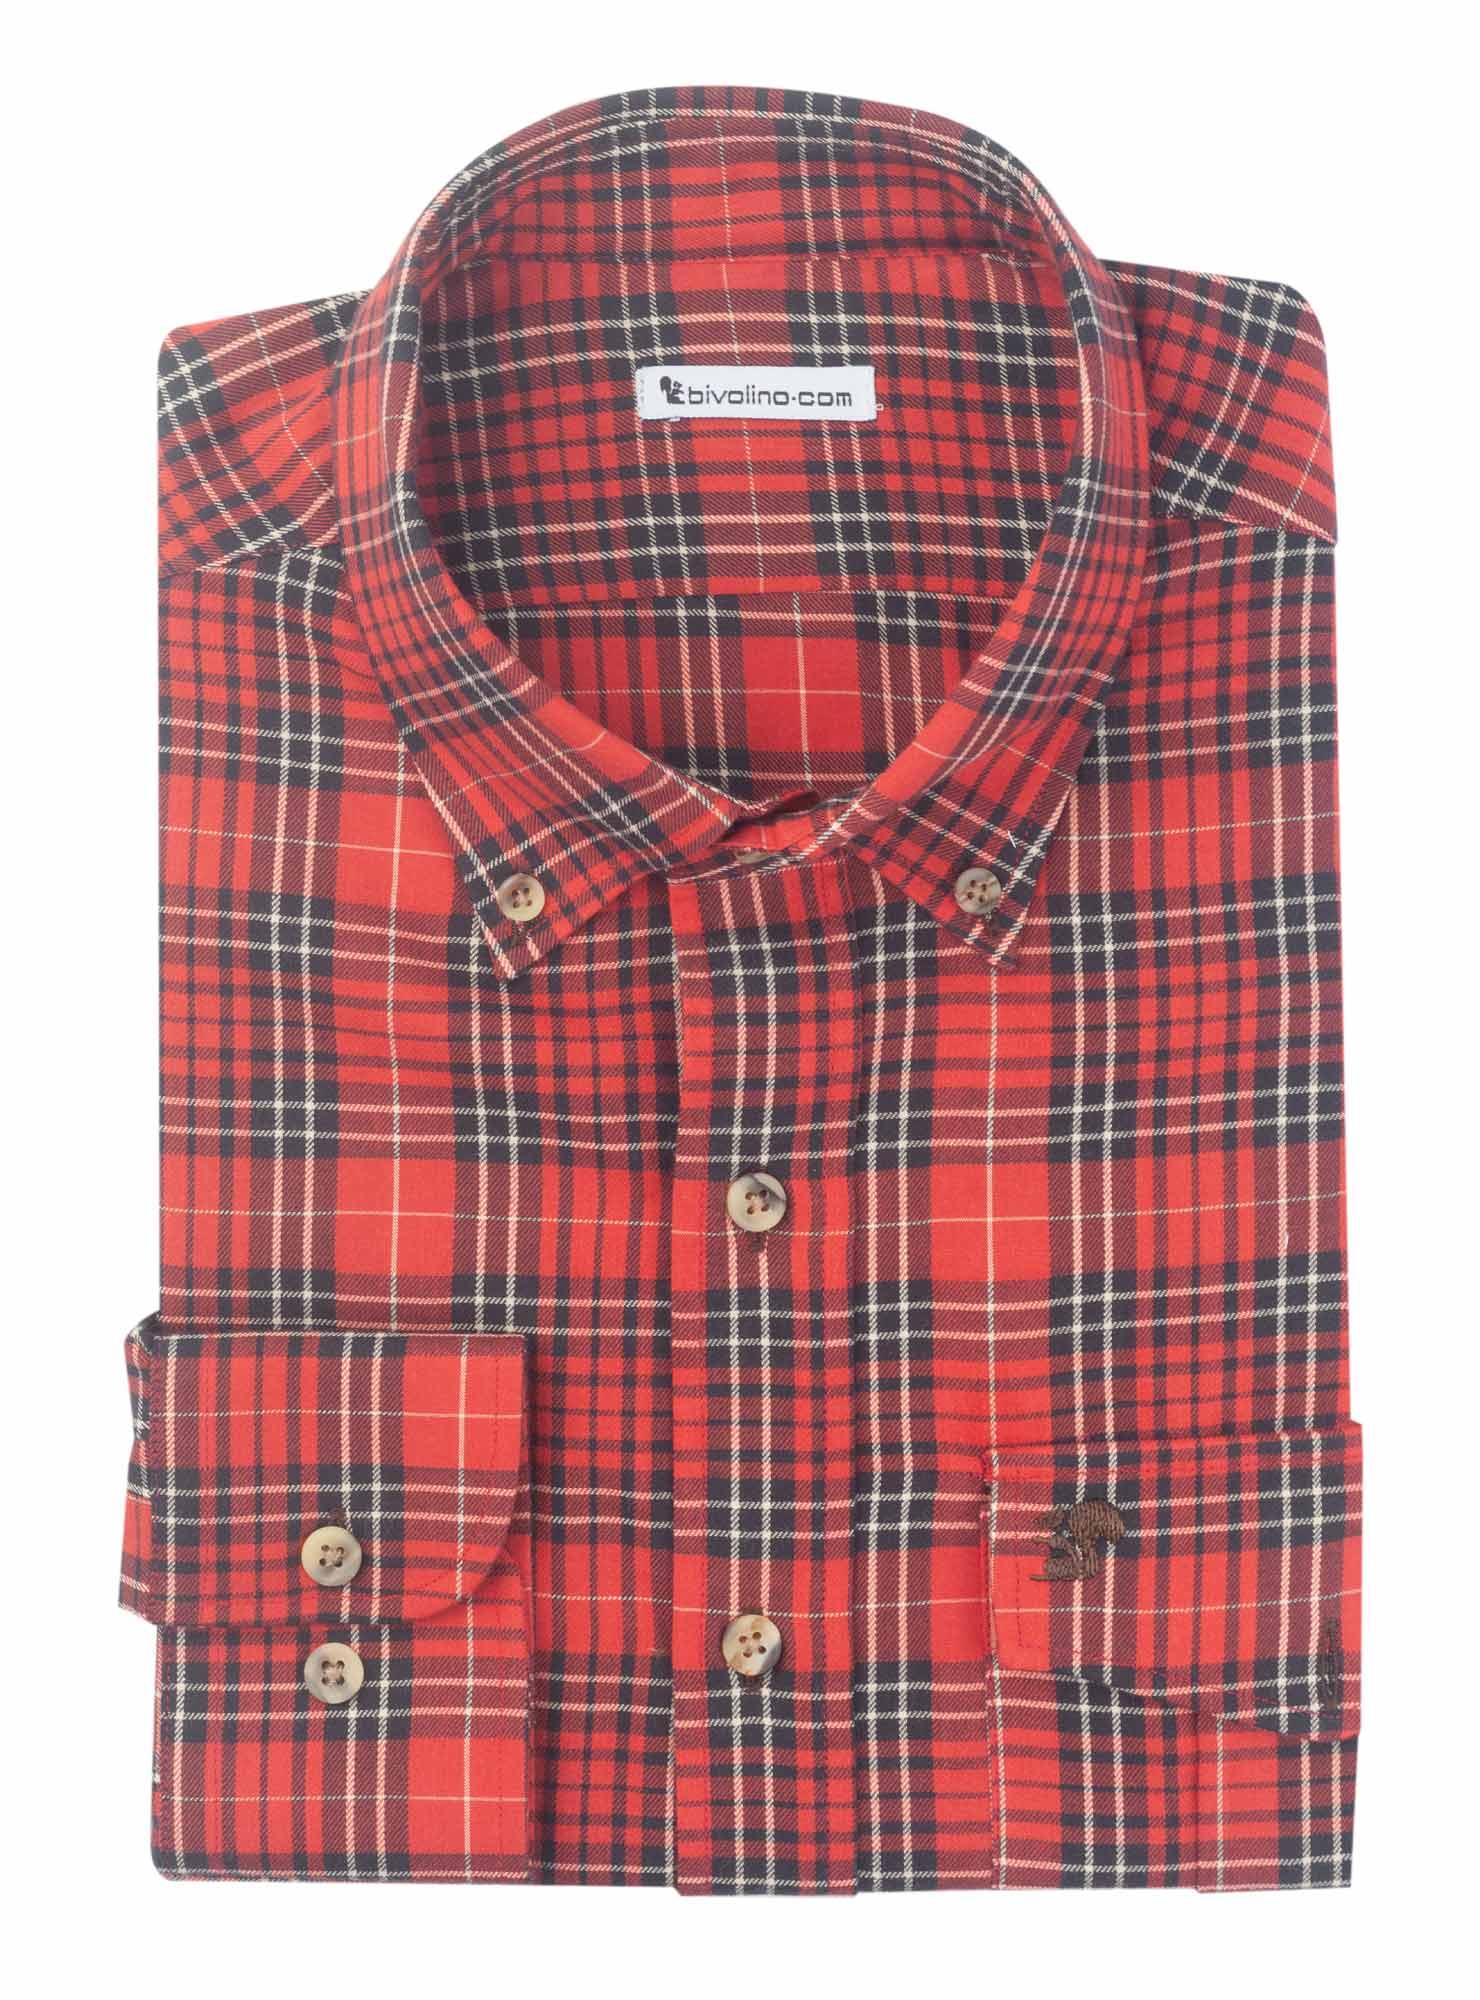 LATINA - Flannel  Tartan Check men shirt - LICO 2 - TARTAN